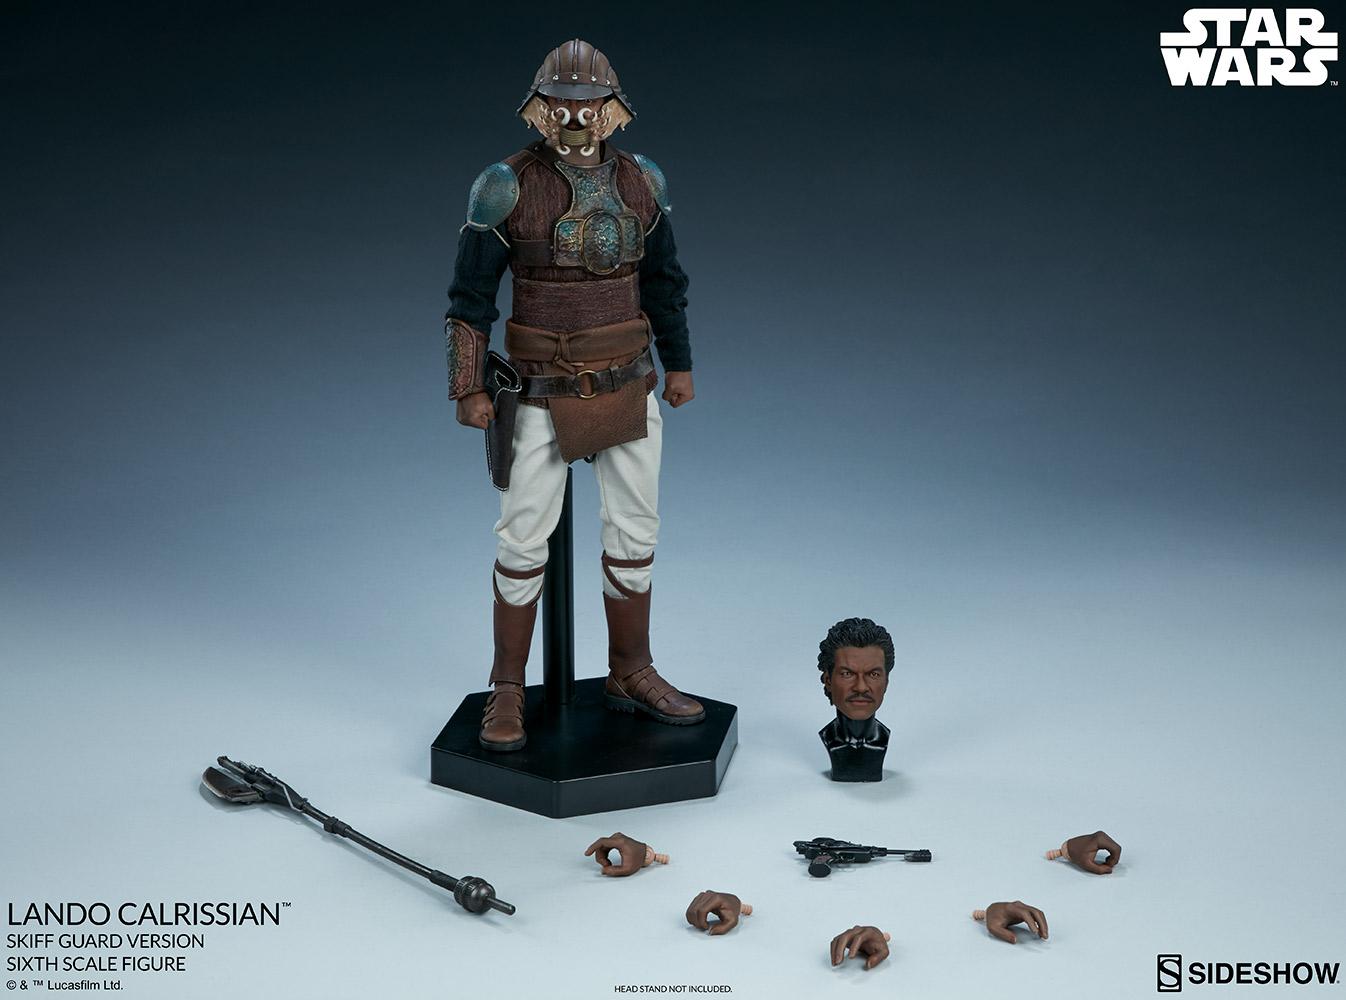 Sideshow Lando Calrissian